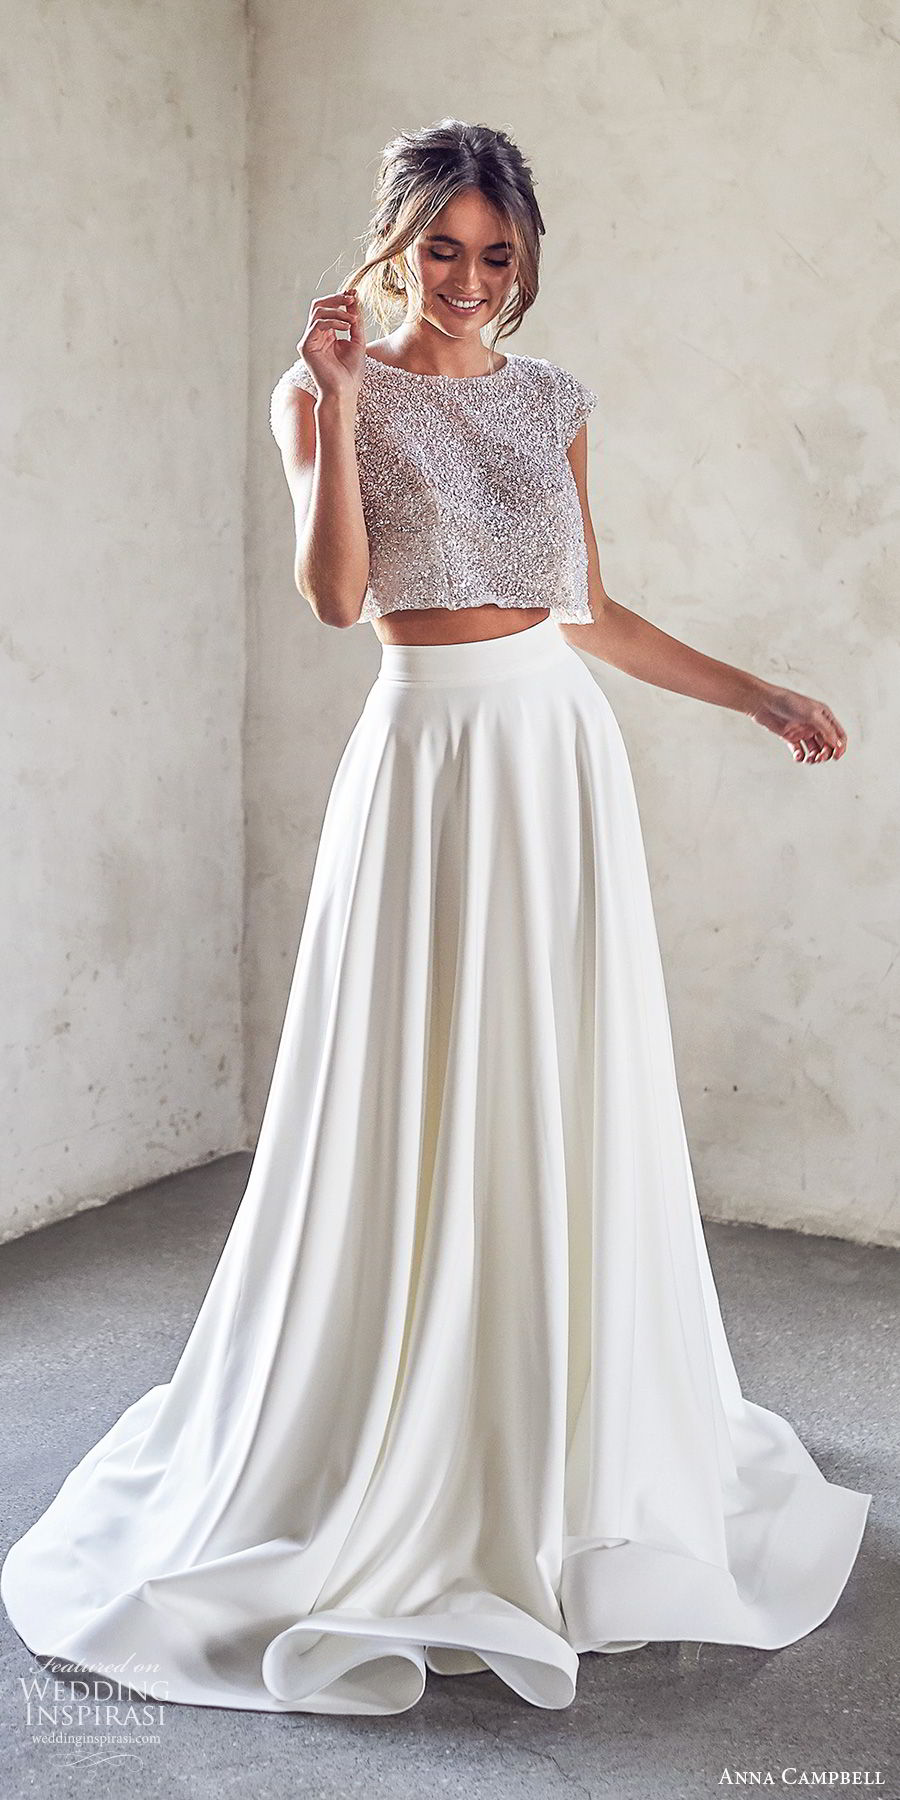 anna campbell 2020 bridal cap sleeves jewel neck embellished bodice crop top a line skirt wedding dress (10) modern chapel train mv